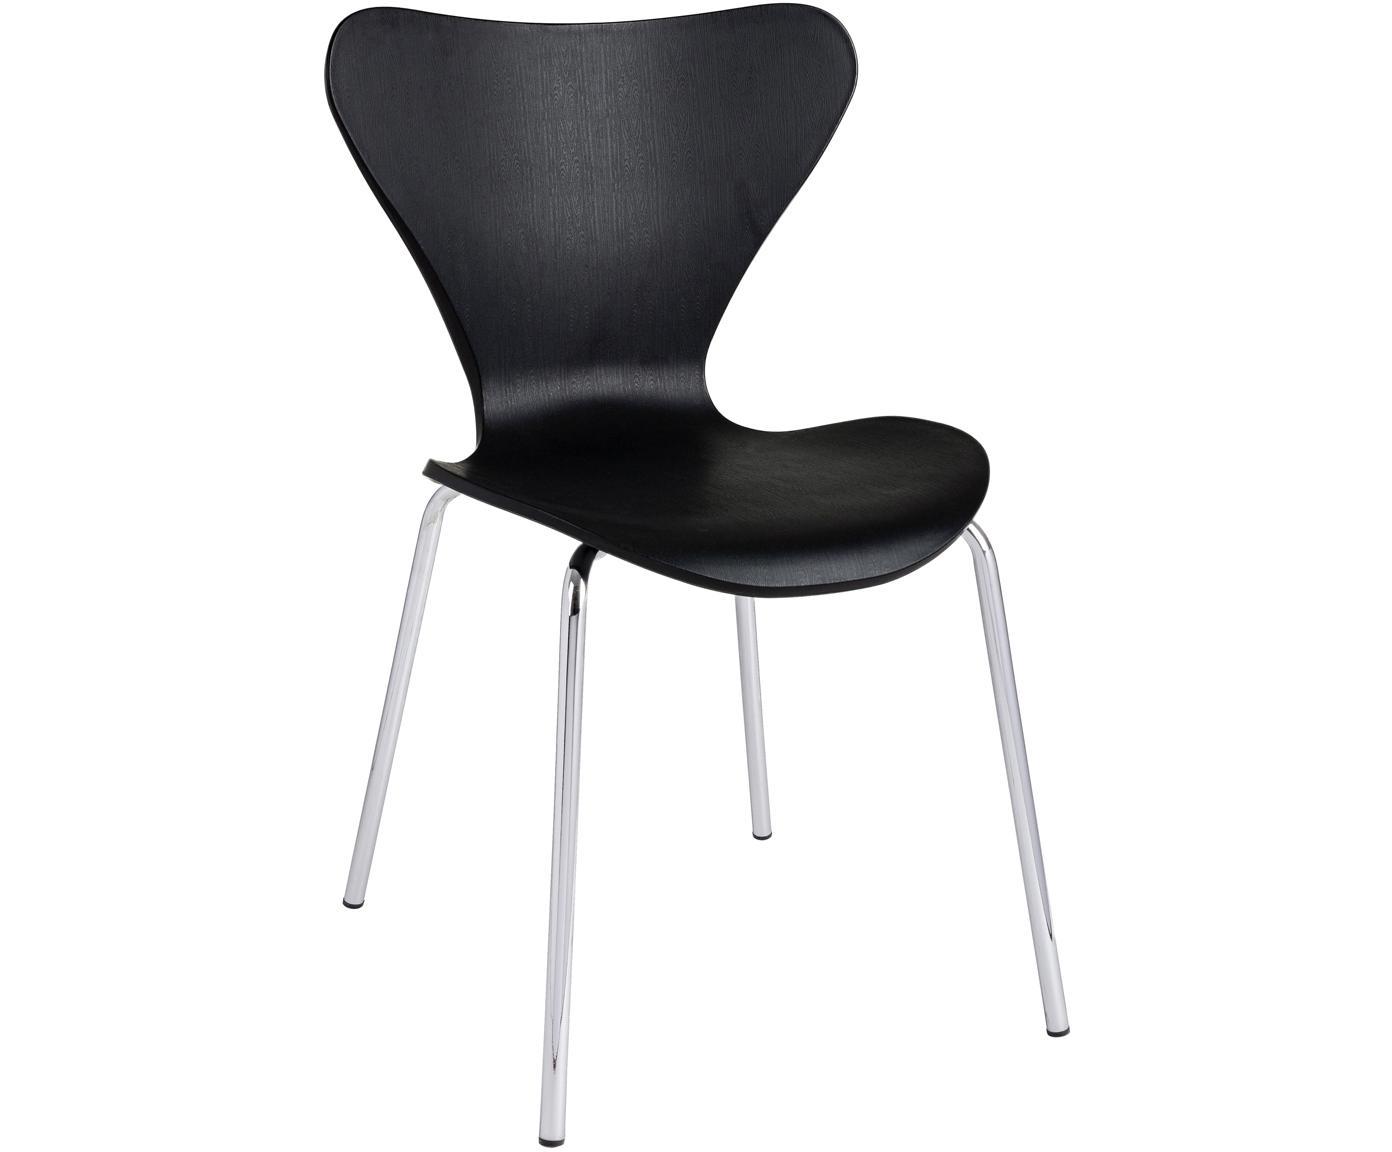 Sedia impilabile in plastica Tessa, 2 pz., Seduta: materiale sintetico (poli, Gambe: metallo cromato, Nero, cromo, Larg. 50 x Prof. 50 cm